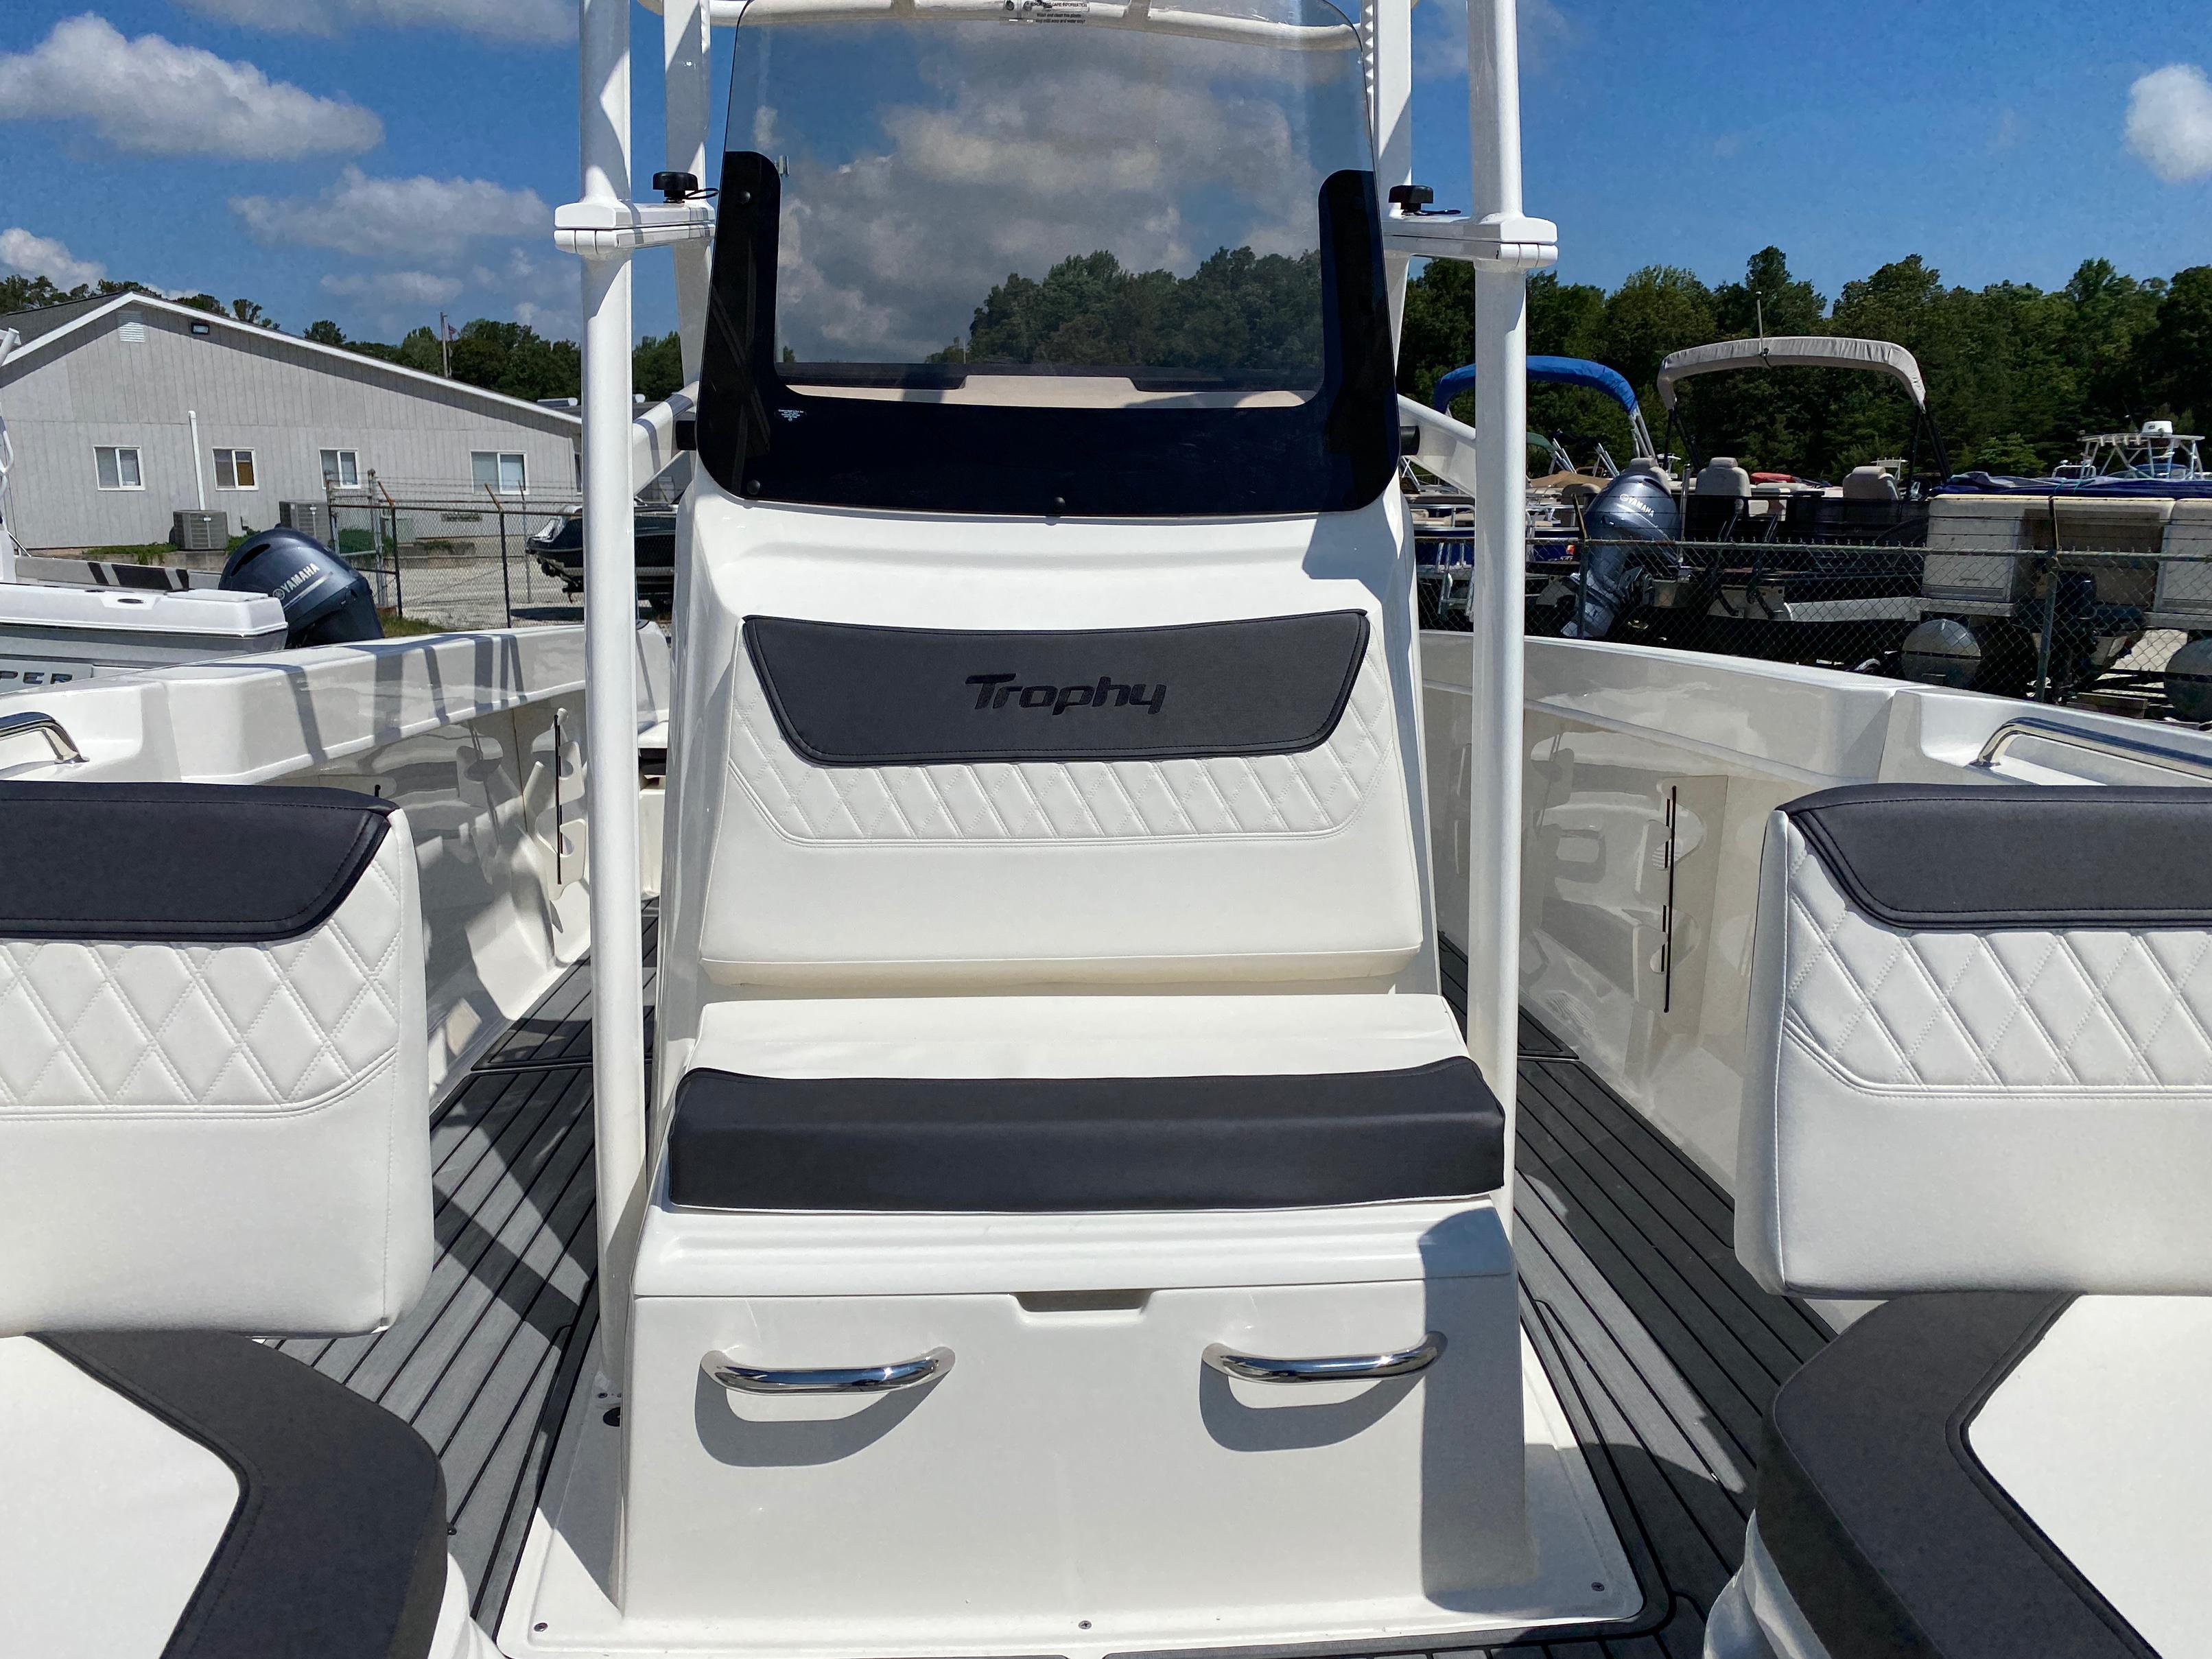 2020 Bayliner boat for sale, model of the boat is Trophy 22CC & Image # 14 of 17